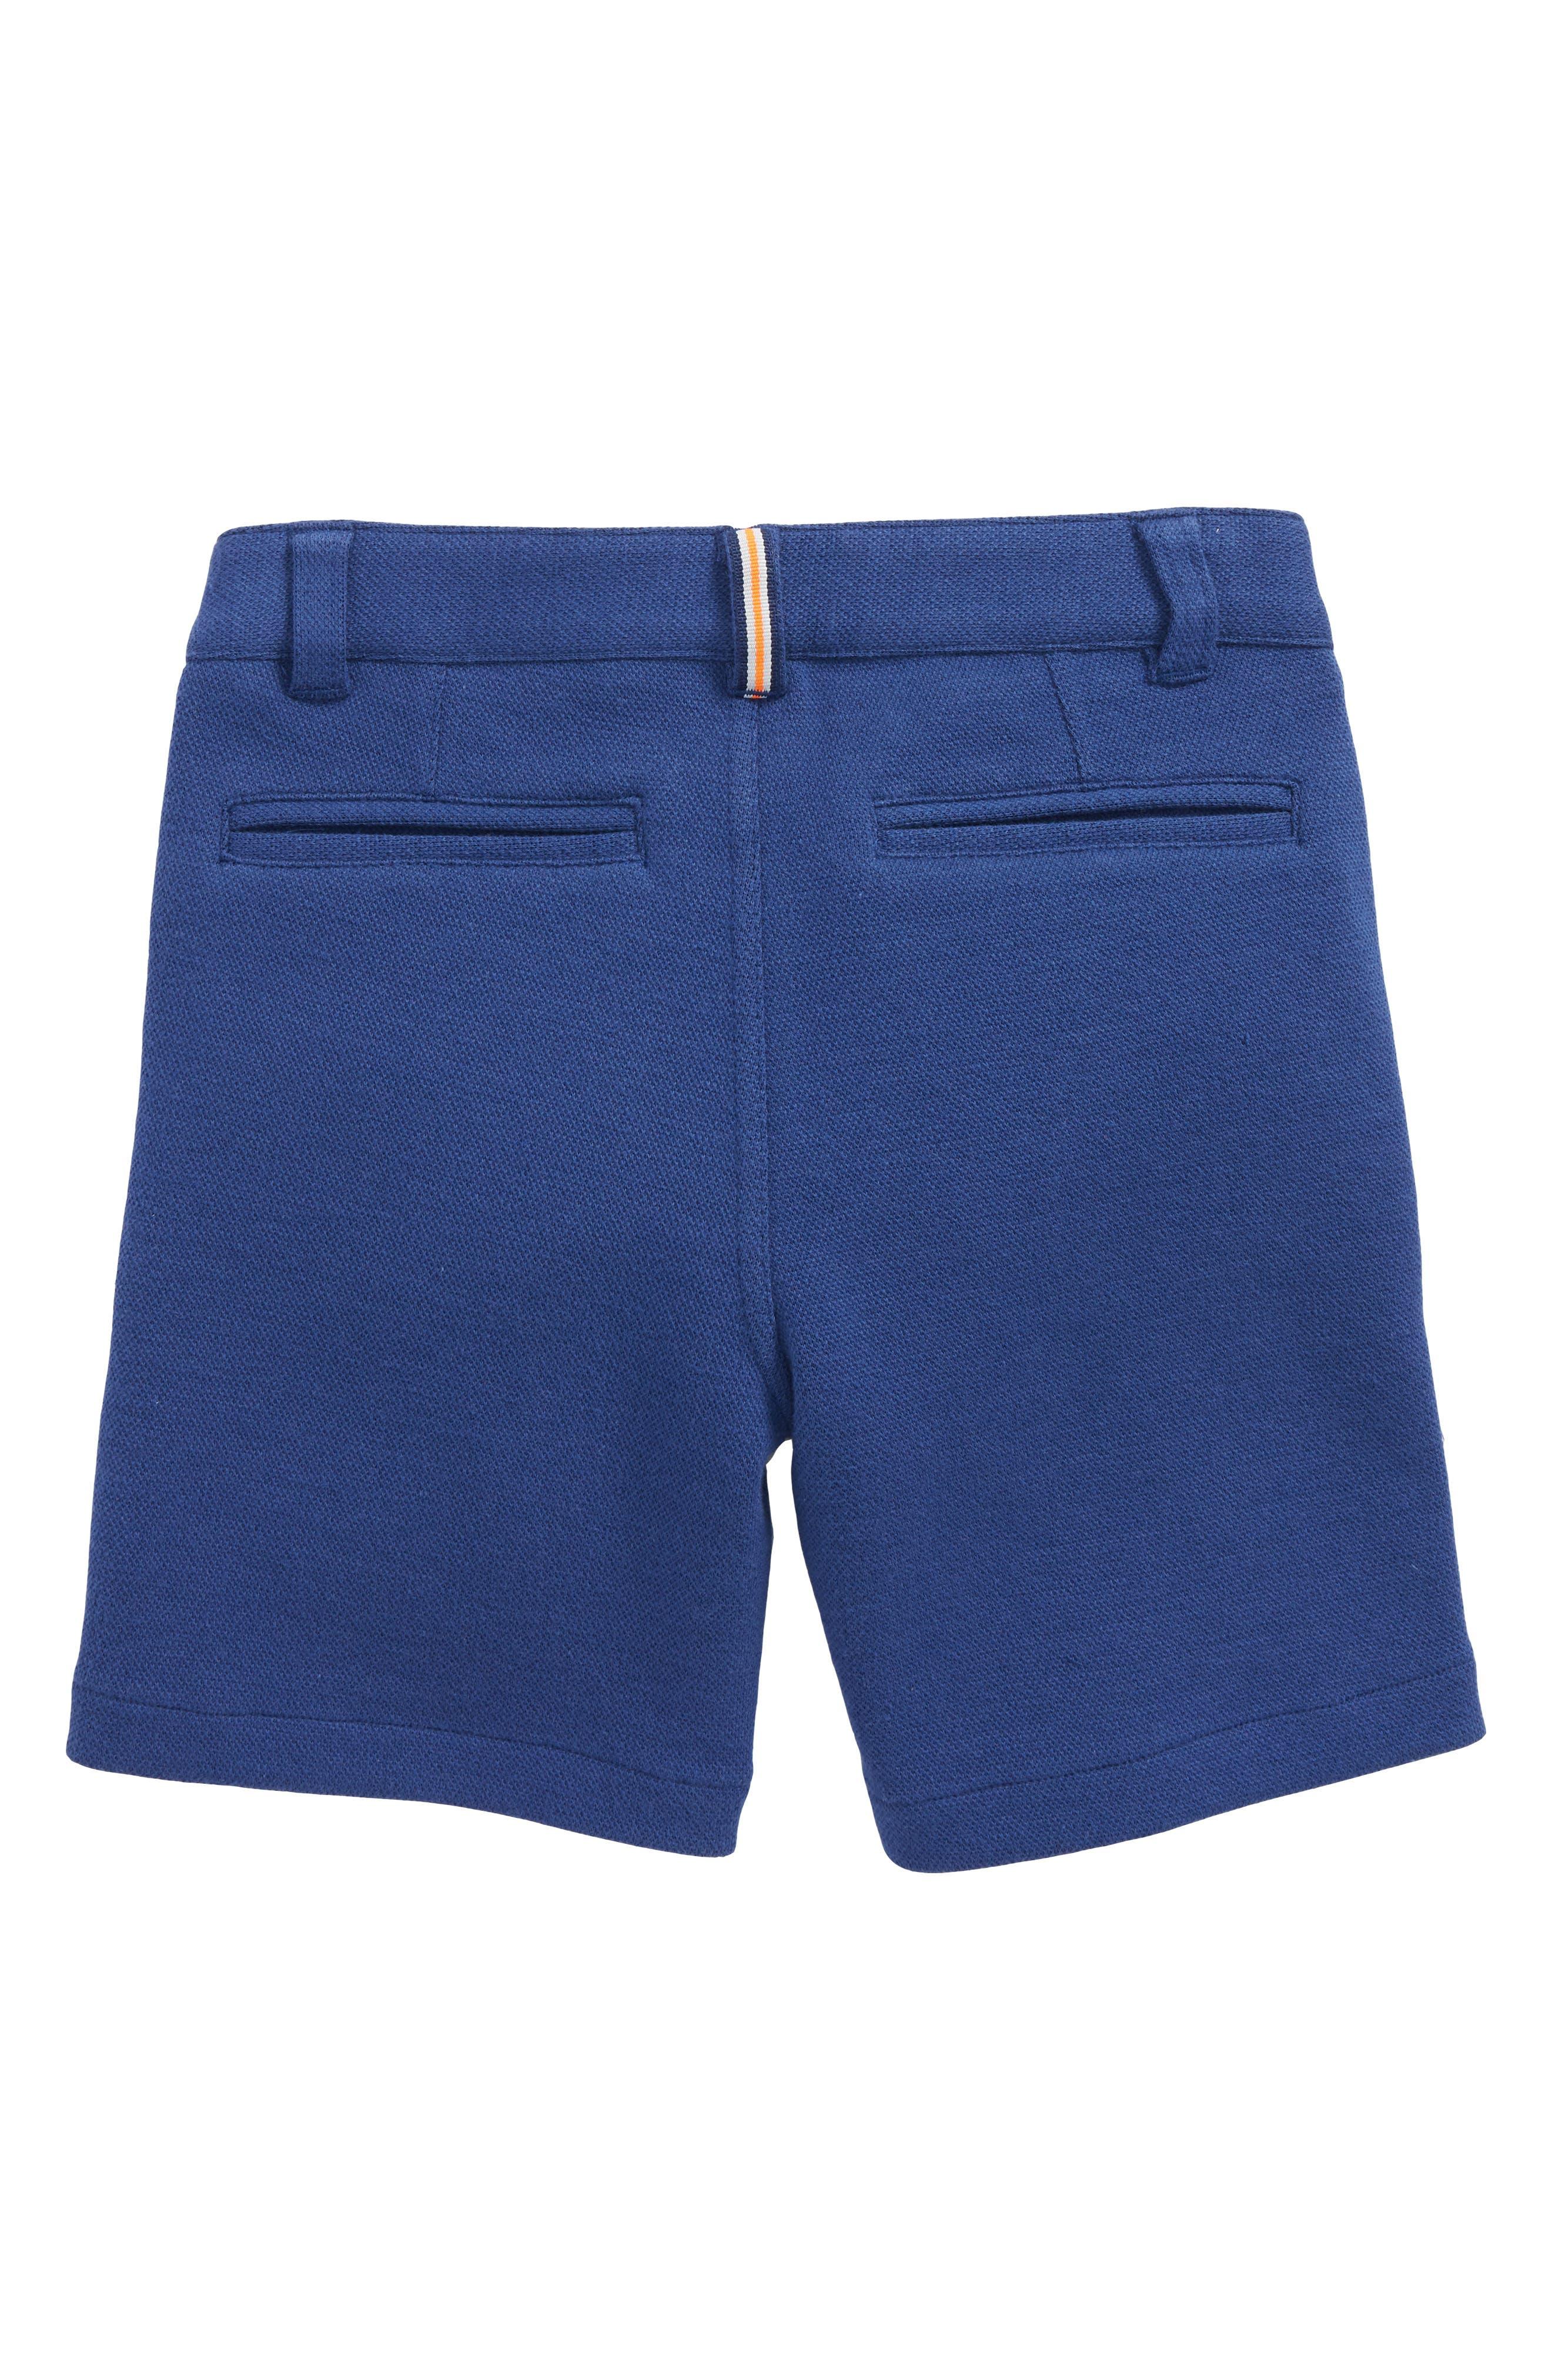 Jersey Chino Shorts,                             Alternate thumbnail 2, color,                             Beacon Blue